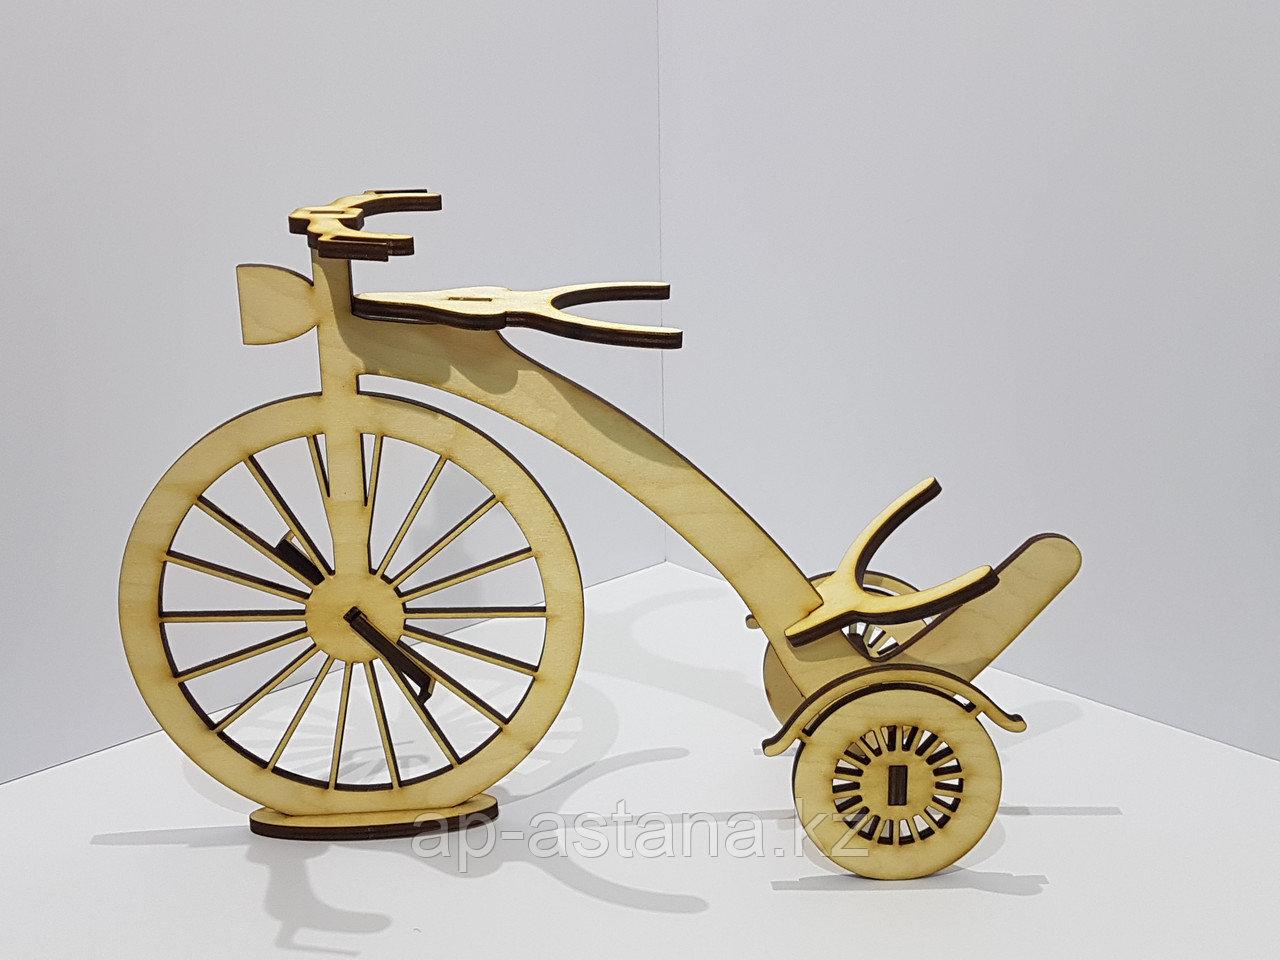 "Подставка под вино. Велосипед. - Полиграфия ""Академия печати"" в Астане"